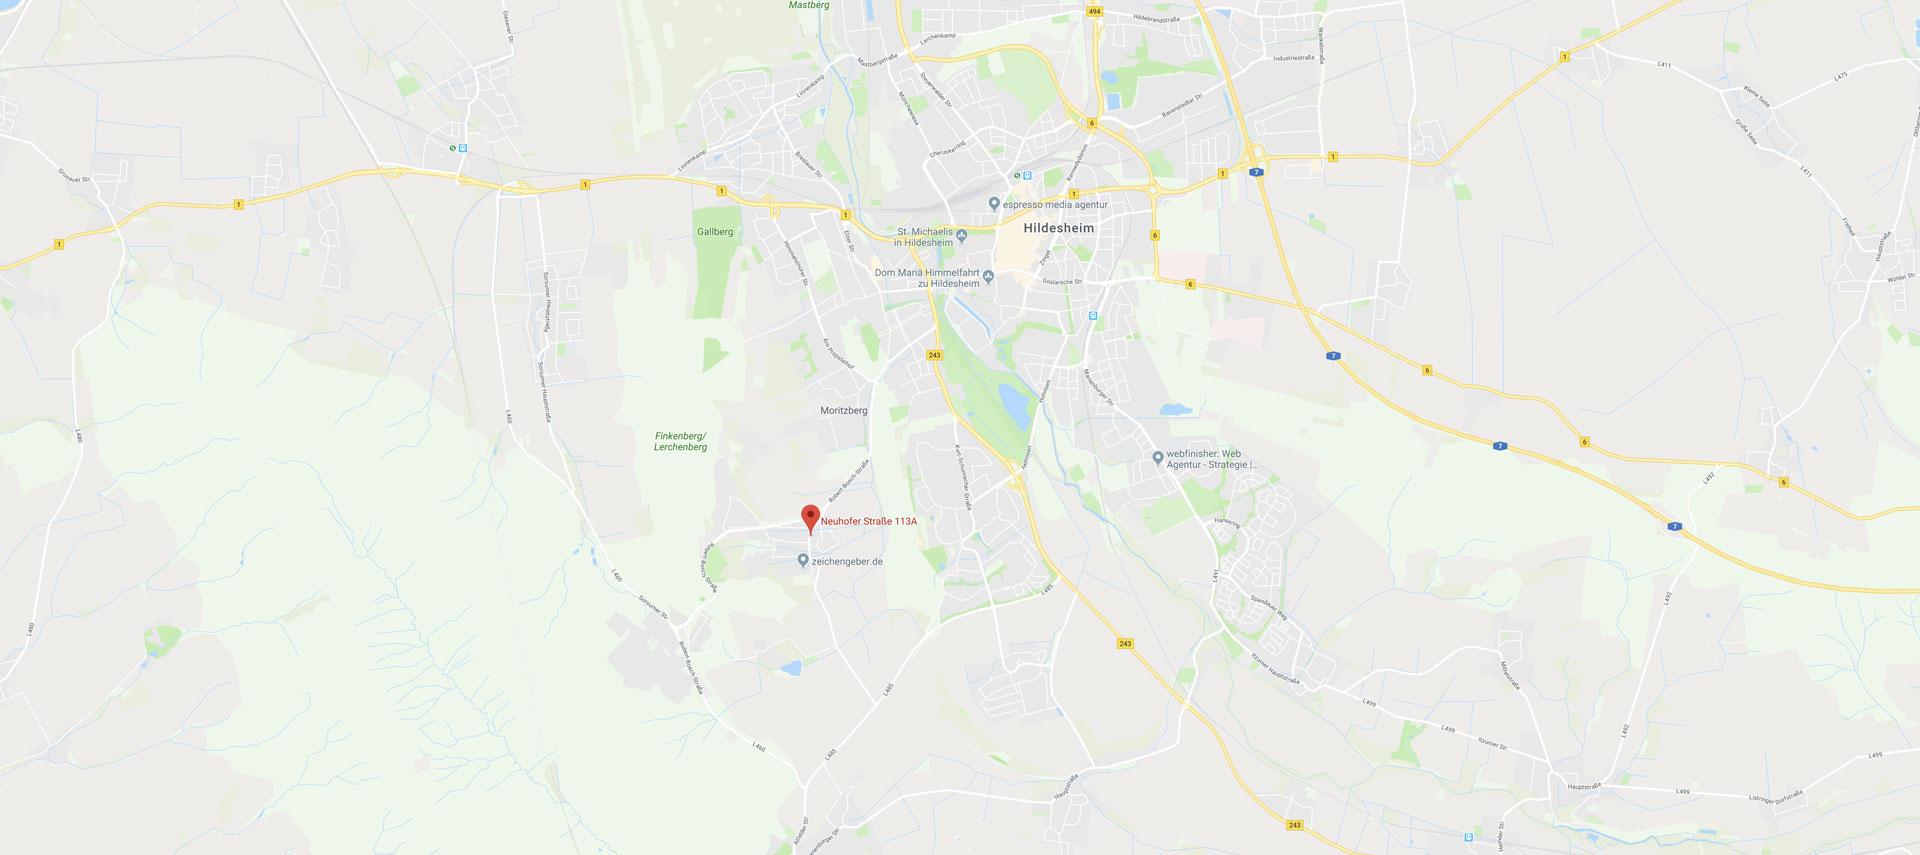 Neuhofer Straße 113a 31139 Hildesheim